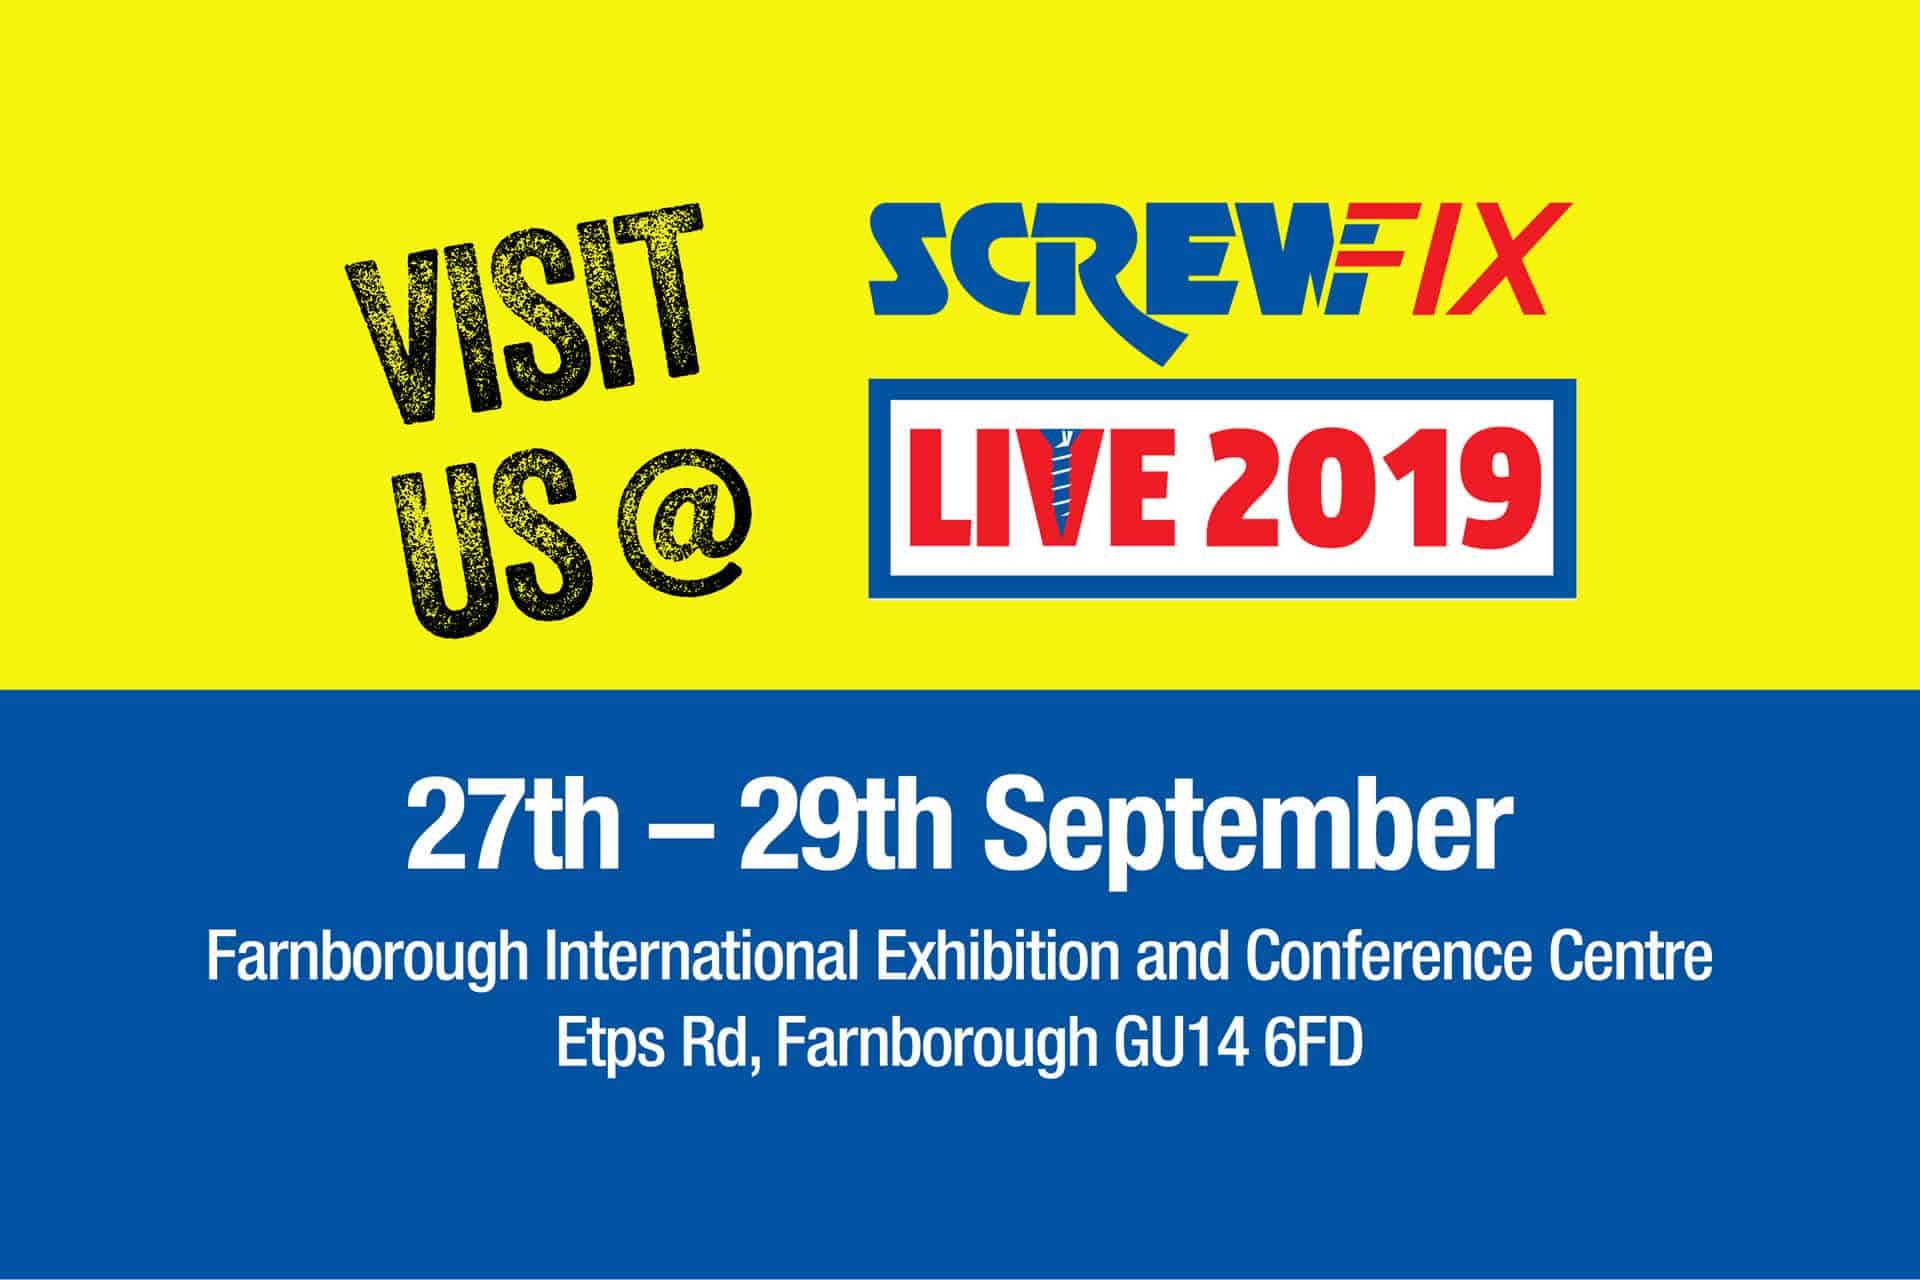 Visit WD-40 @ Screwfix Live 2019